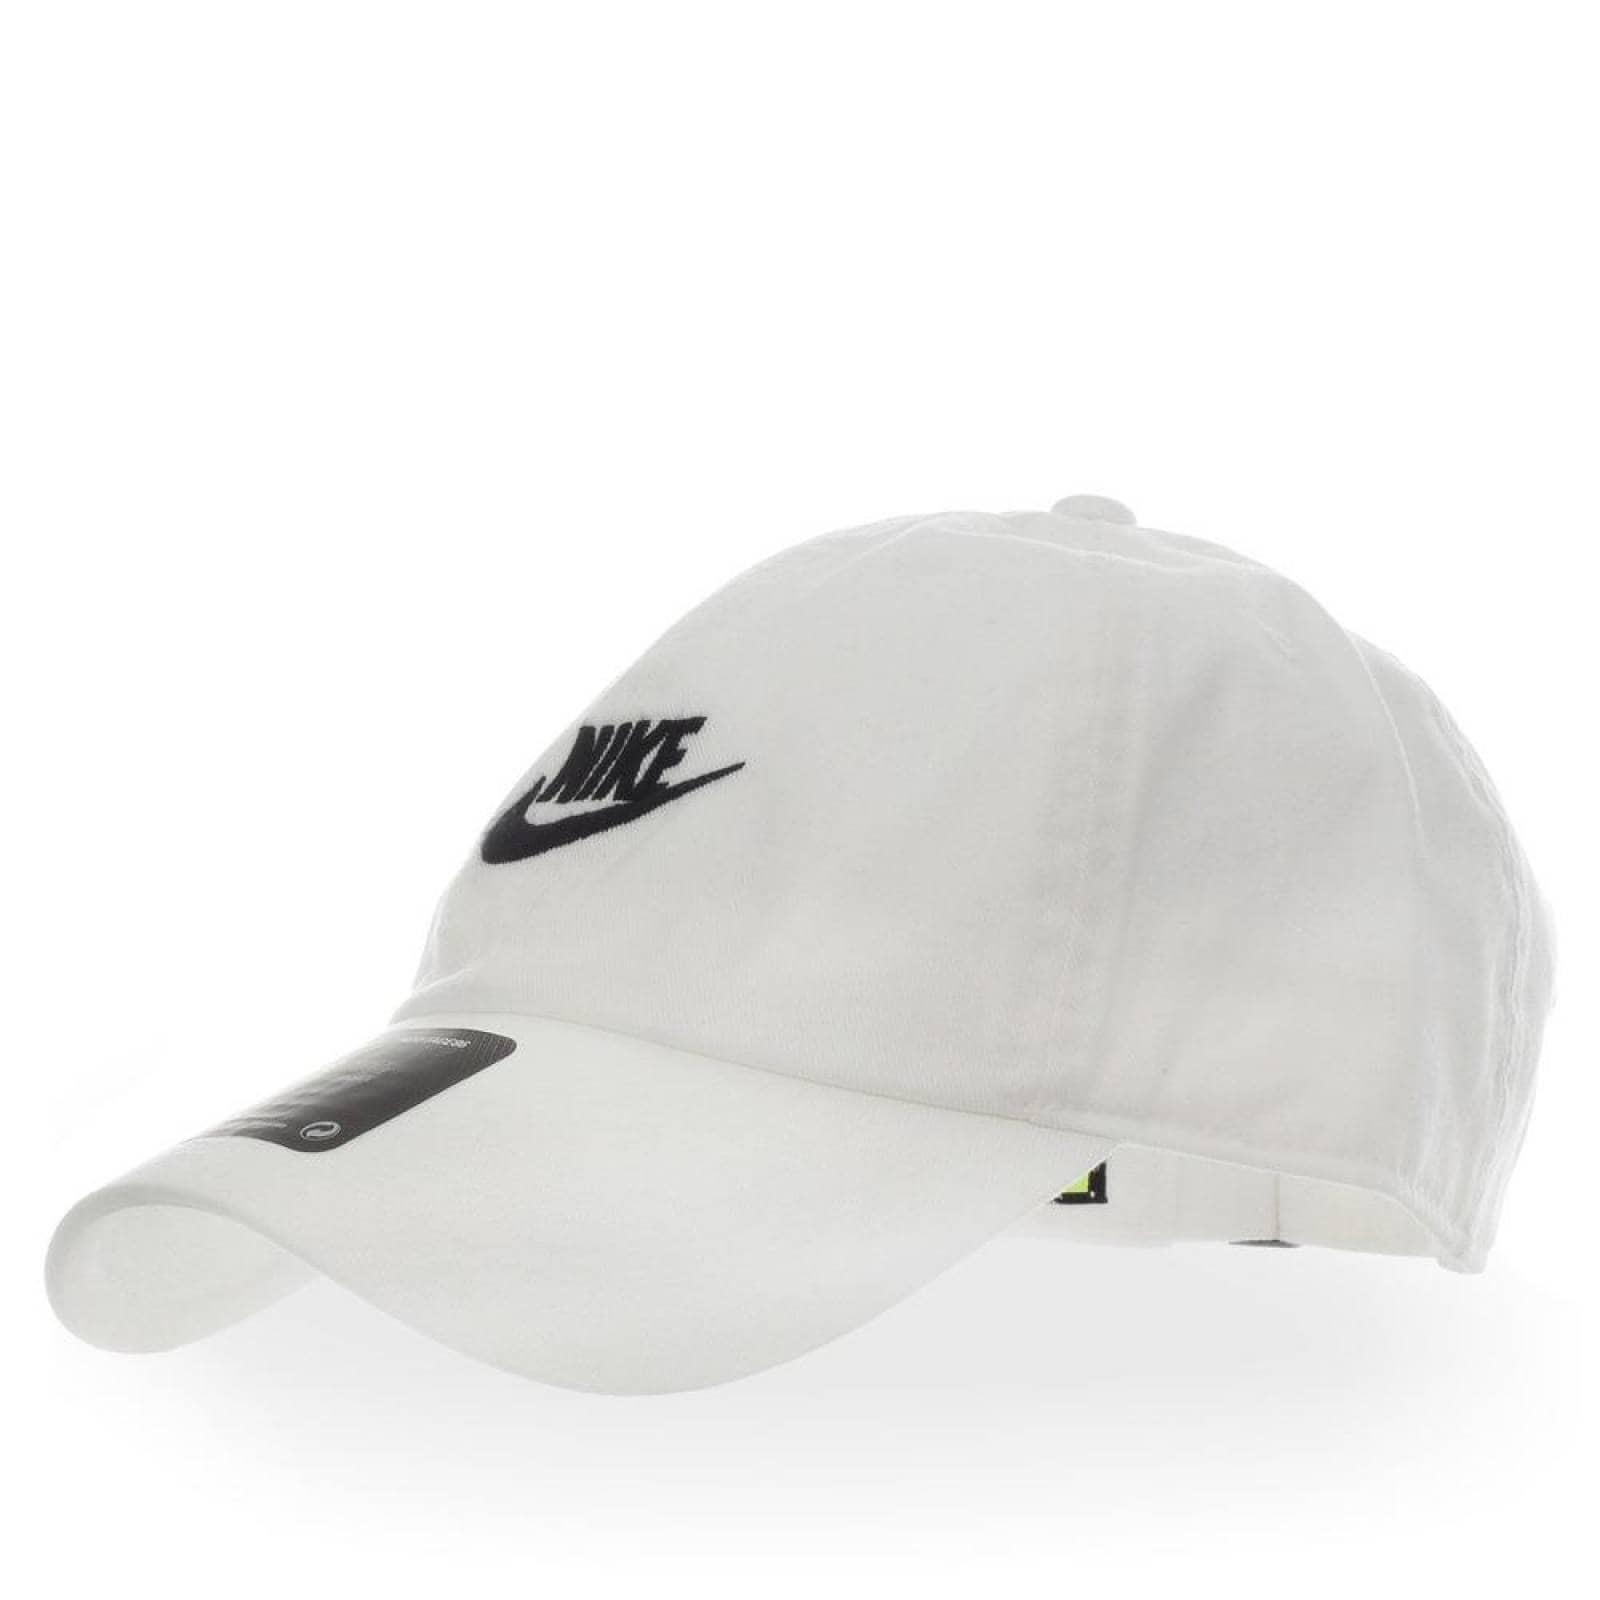 Gorra Nike H86 Futura 913011100 Blanco Unisex